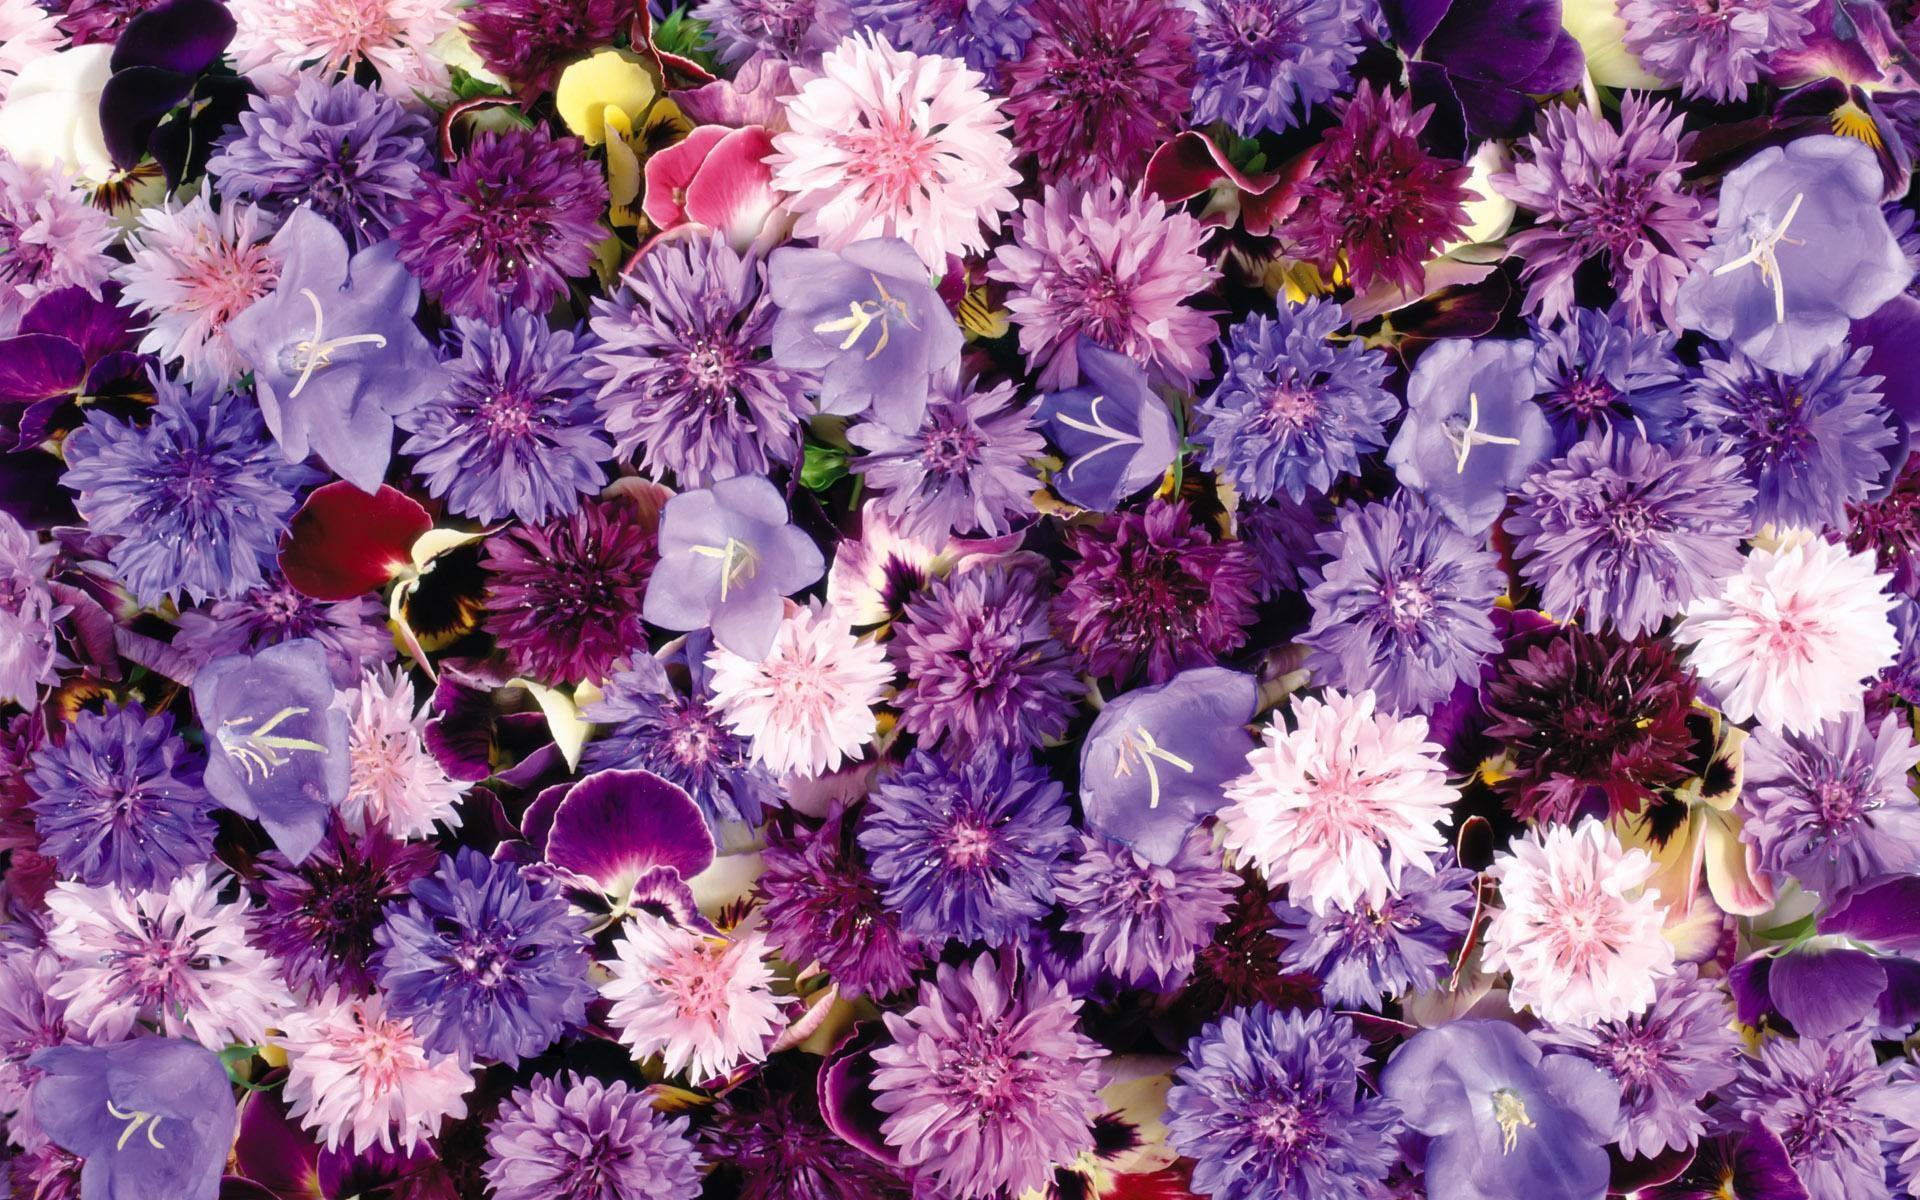 Beautiful Wallpaper Aesthetic Purple - 793619-tumblr-purple-backgrounds-1920x1200-windows  2018_203141      .jpg